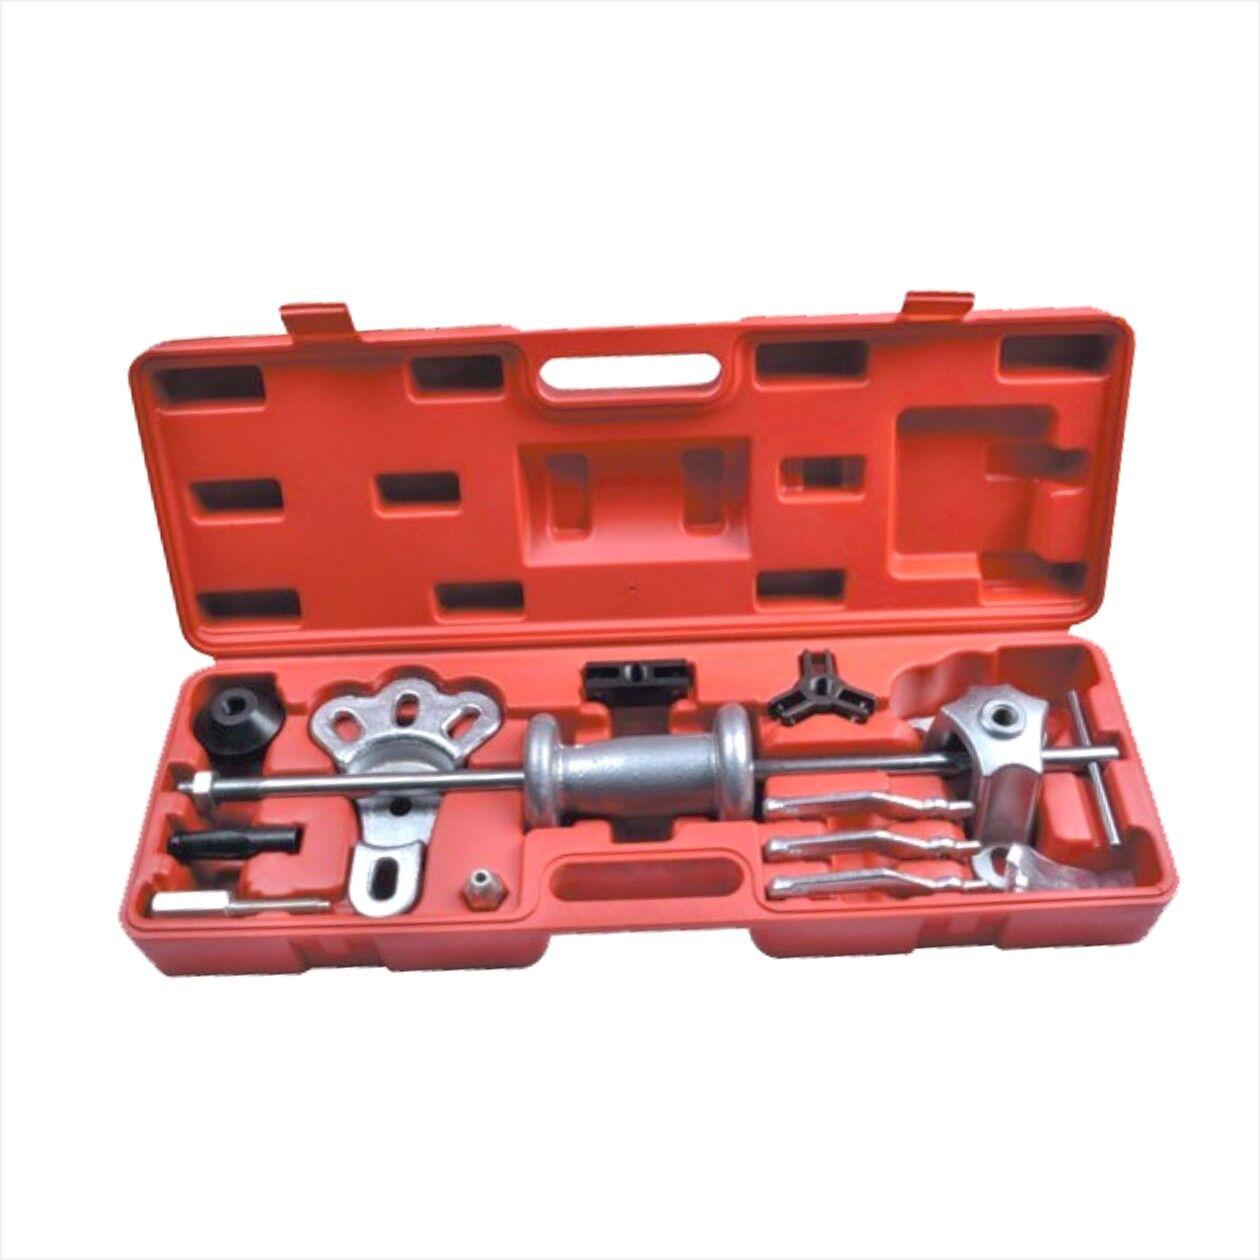 Axles Slide Hammer Puller Set 2 3 Jaw Internal External Puller Bearing Remover Tool